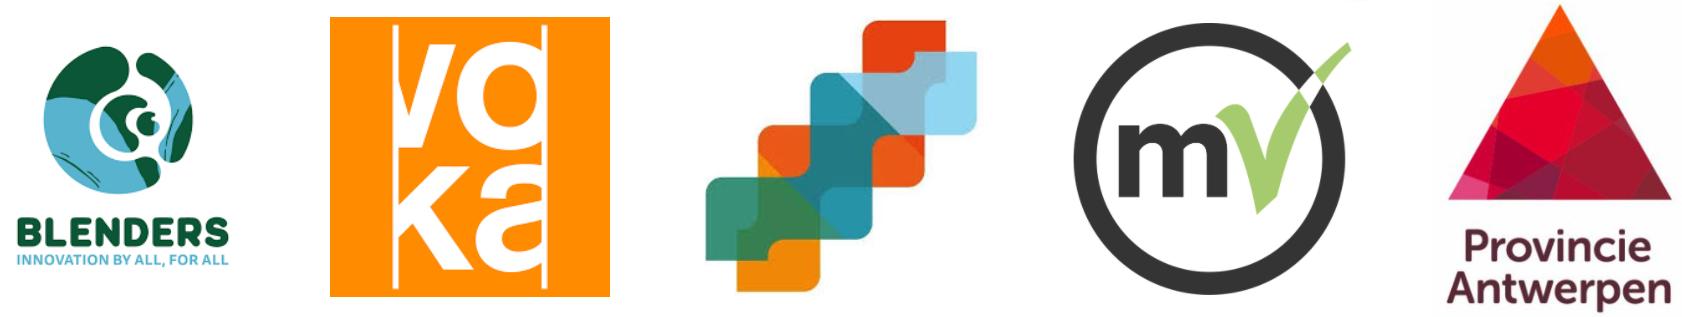 Logos Makani